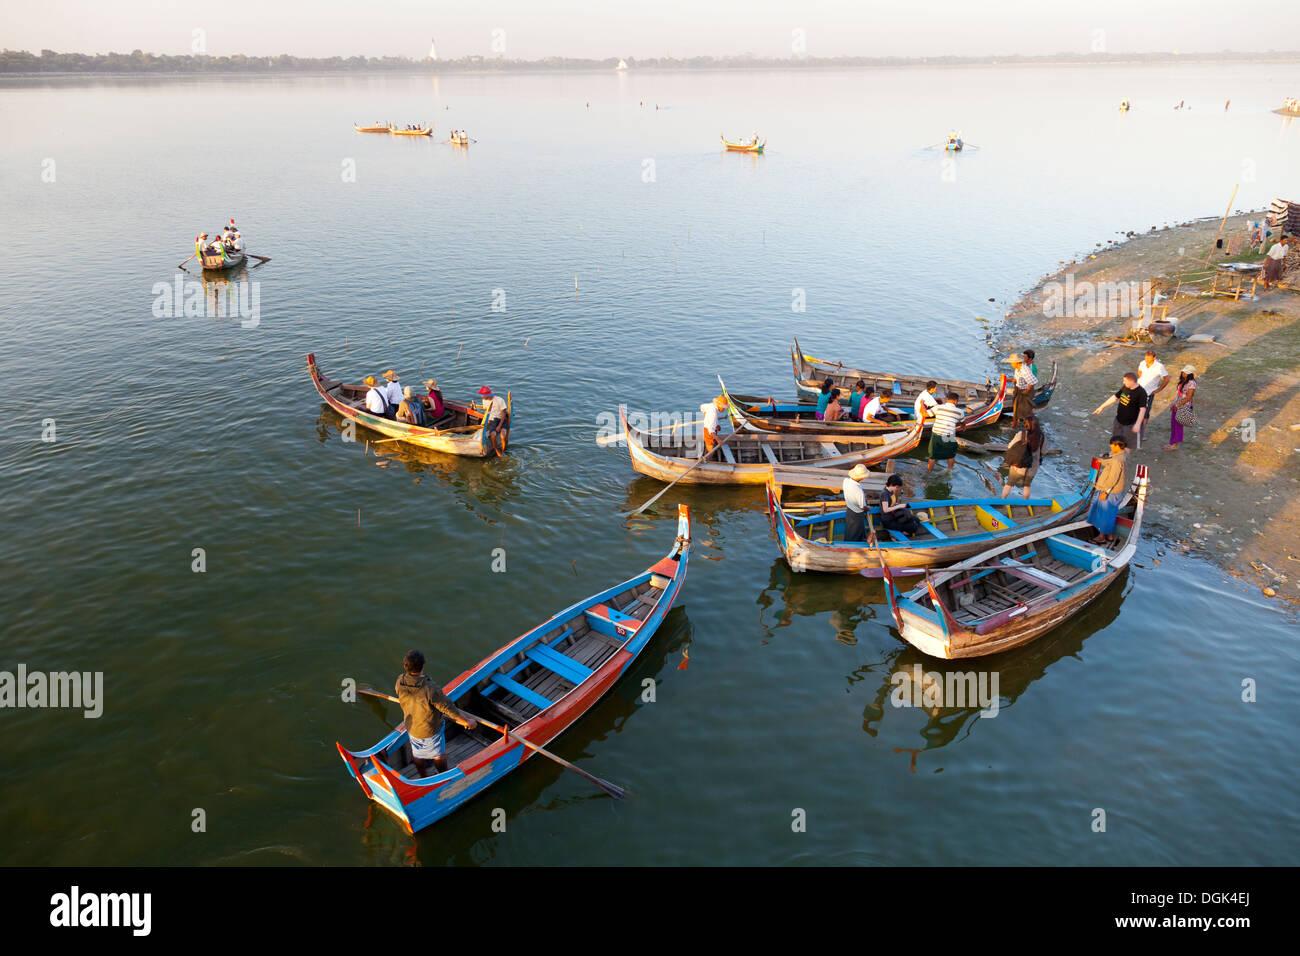 Tourist pleasure boats plying their trade by U Bein Teak Bridge across Taungthaman Lake in Myanmar. - Stock Image